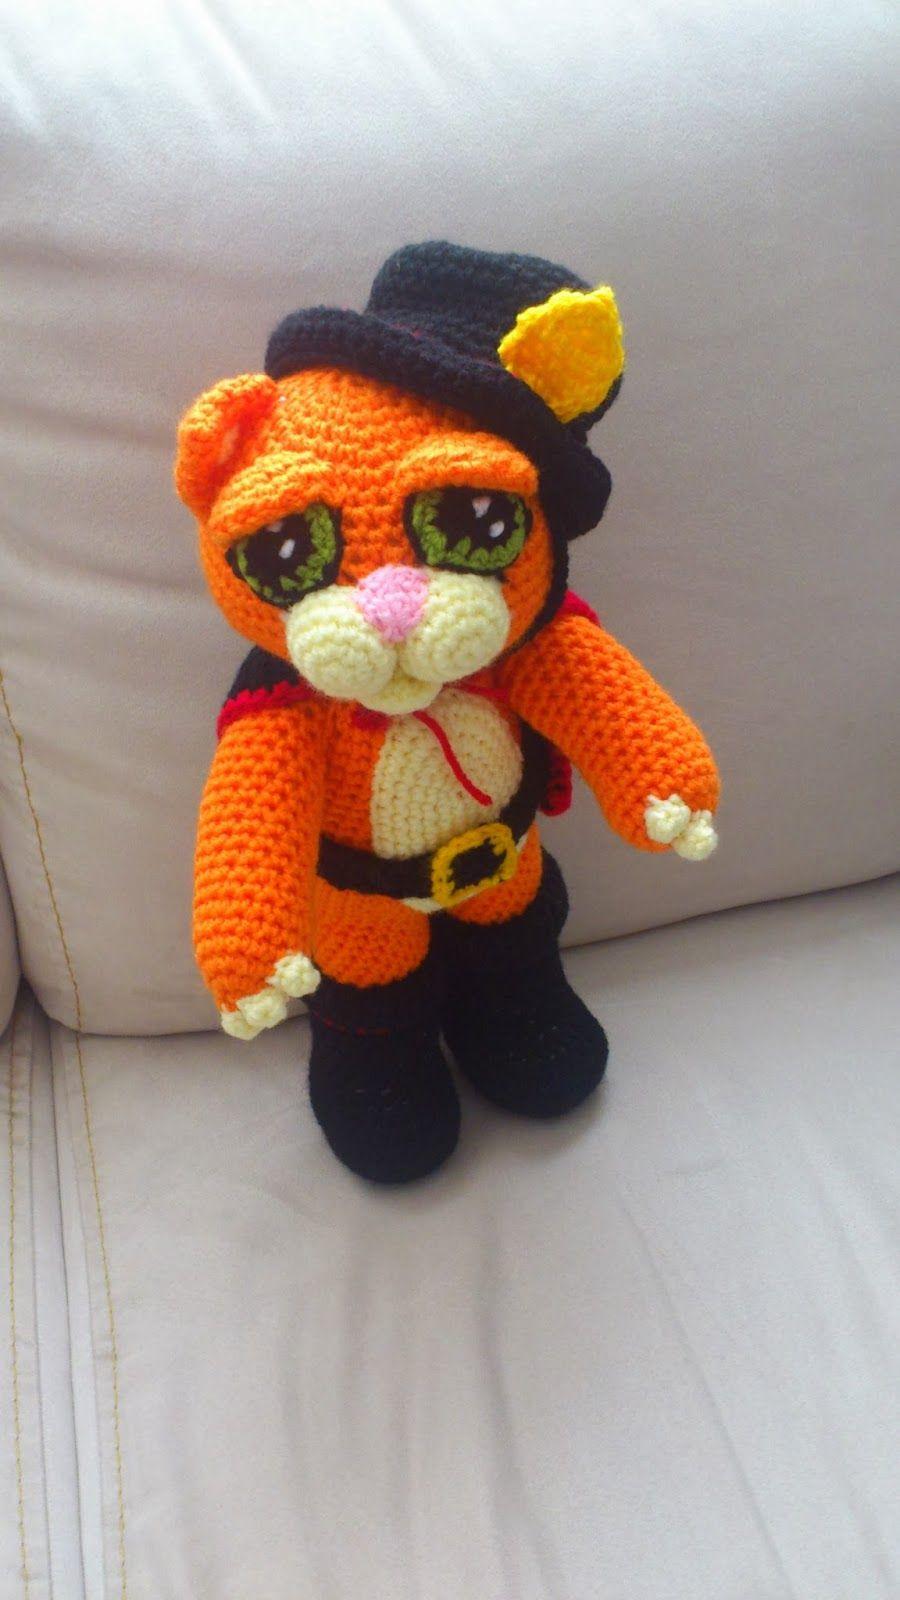 Amigurumi Puss in Boots - FREE Crochet Pattern / Tutorial ...